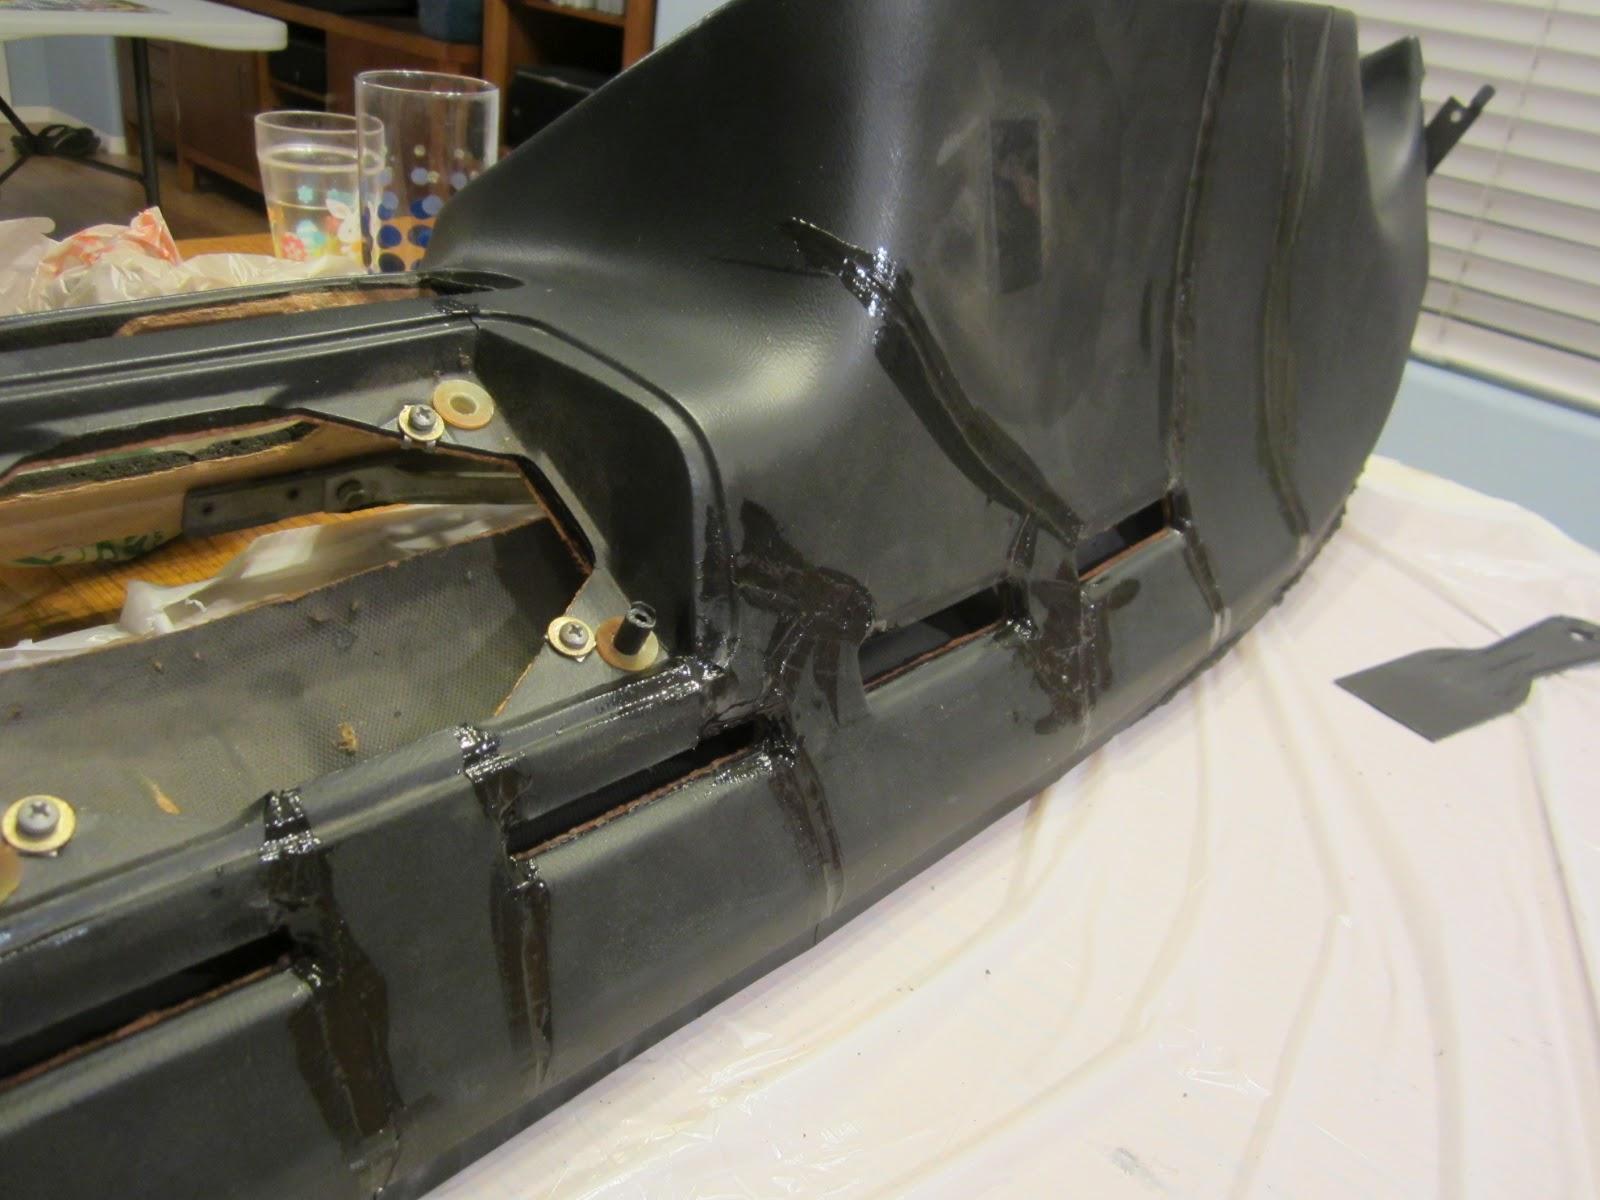 Porsche 924 Electric Conversion Dashboard Repair Part 1